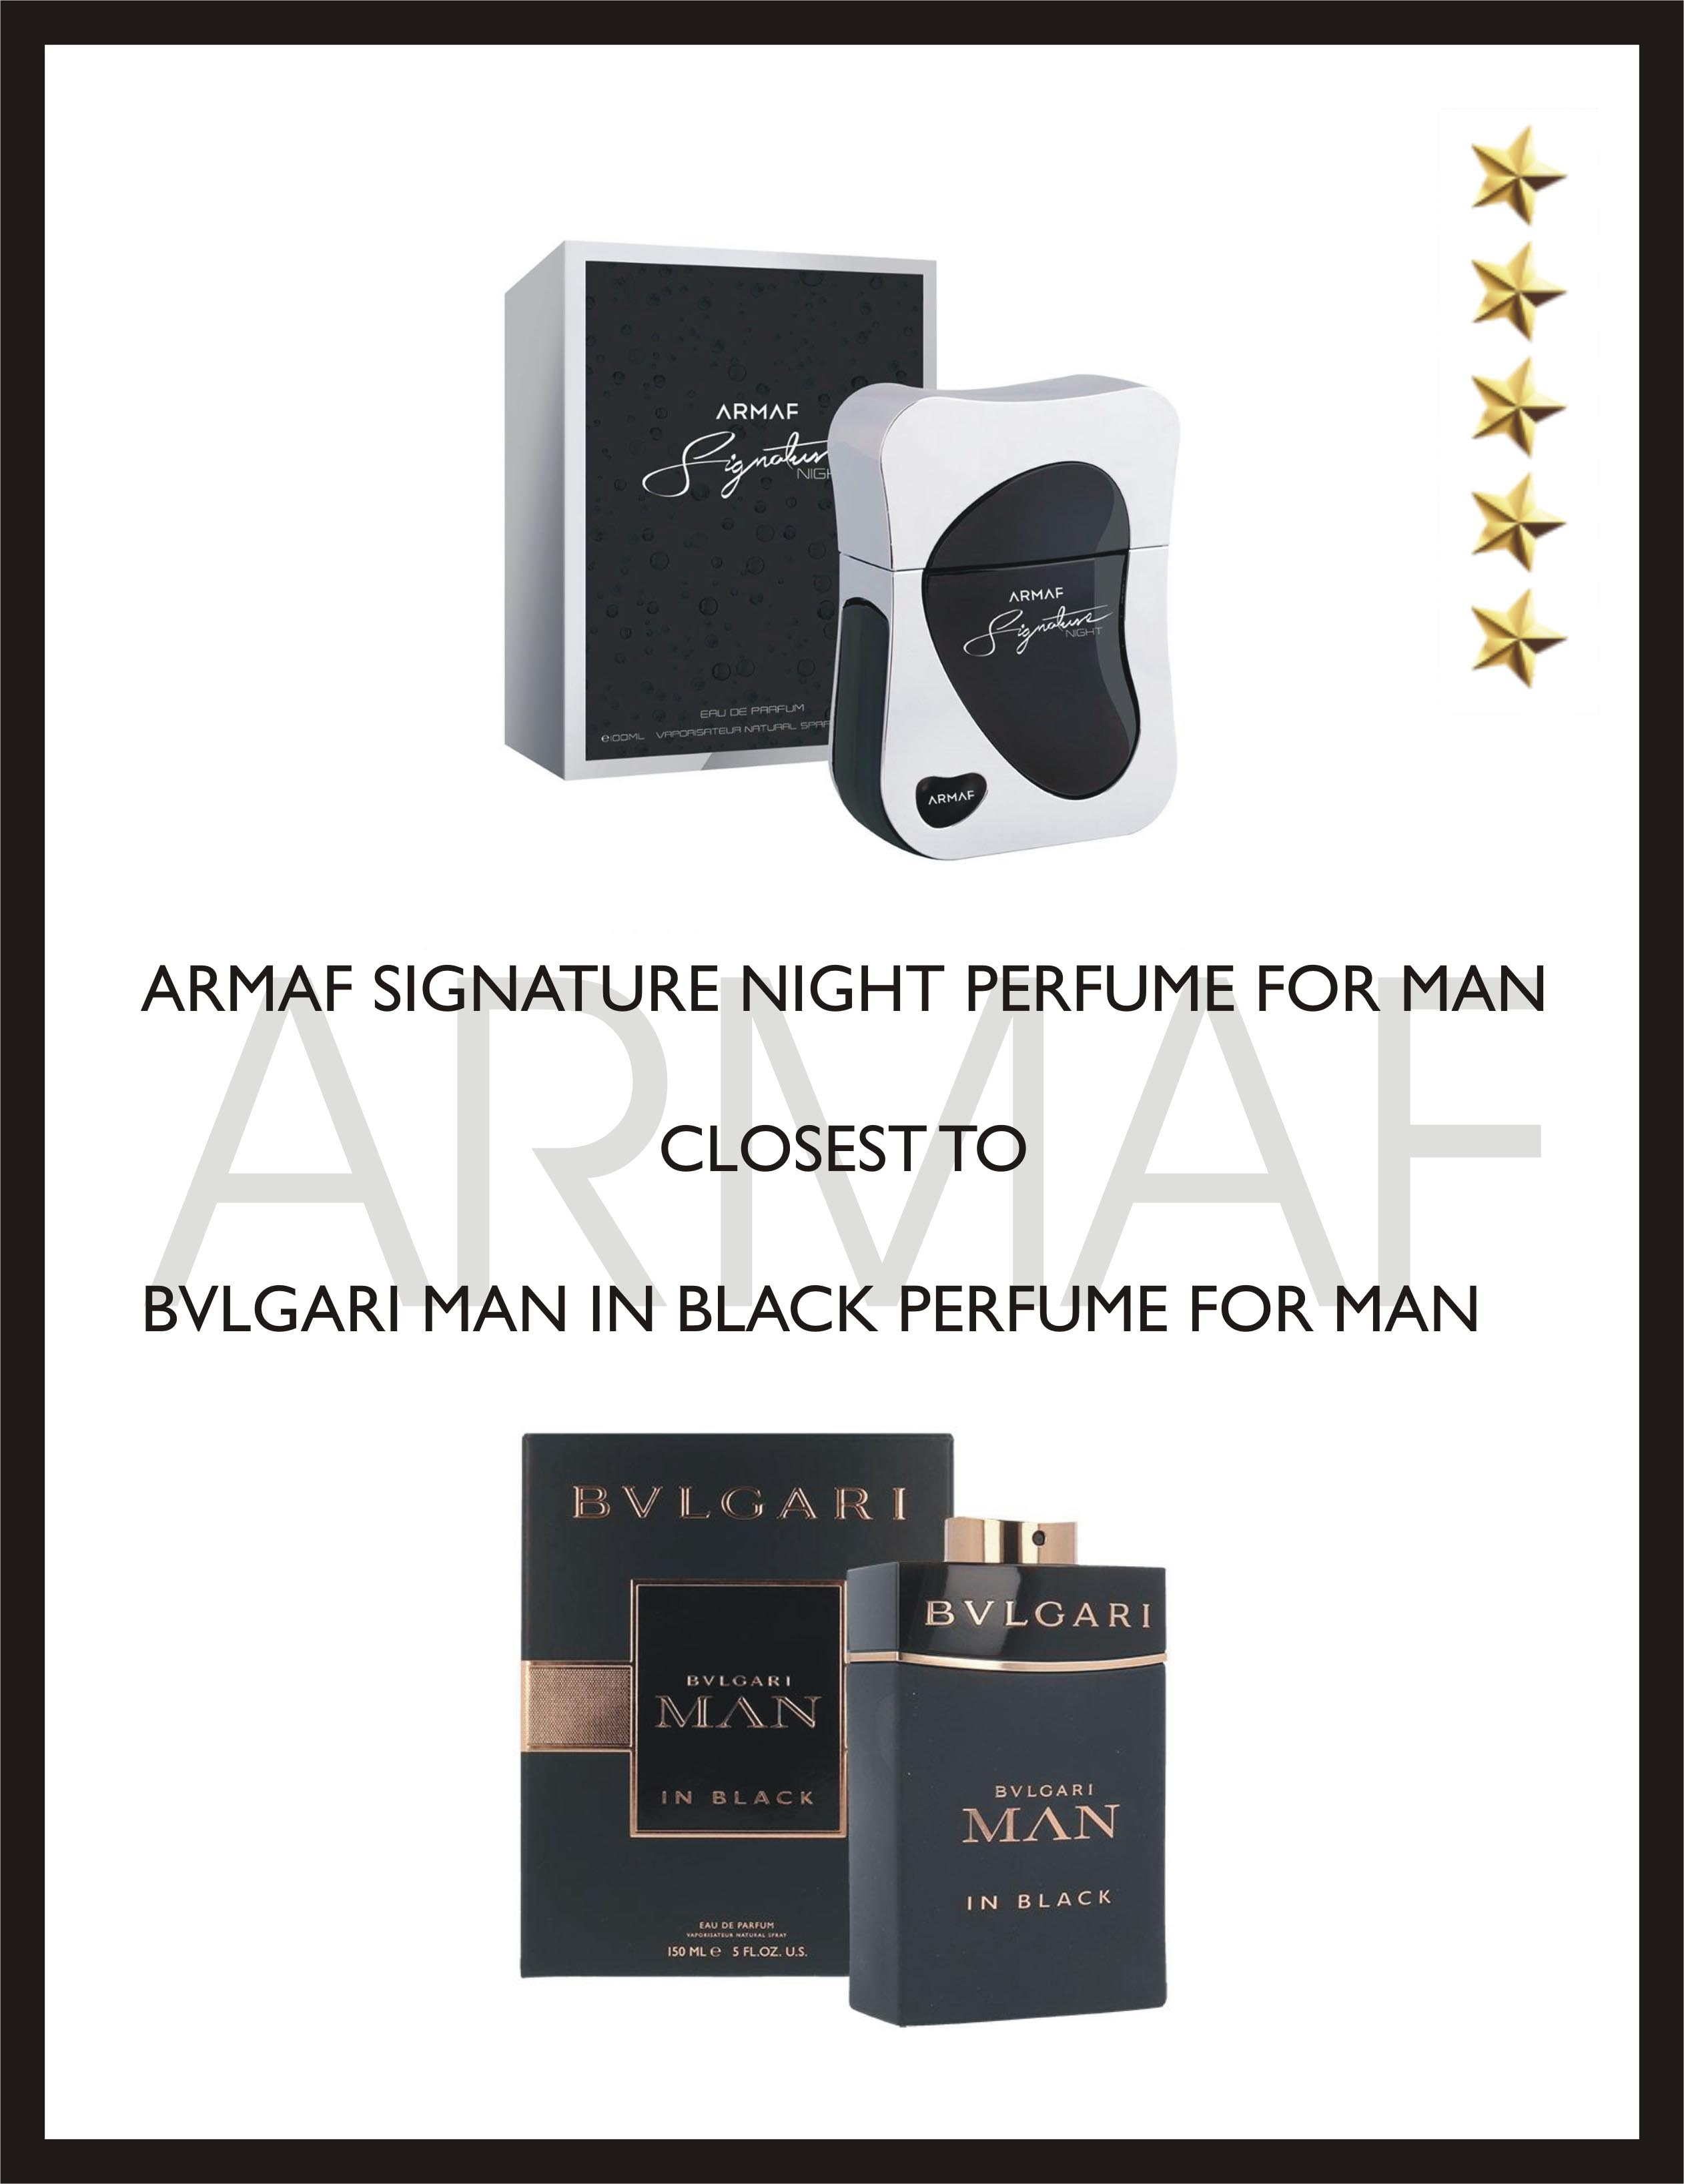 Top 10 New Launch Armaf Fragrances And Clash Of The Clones Bvlgari Man In Black Edp 100ml Signature Night